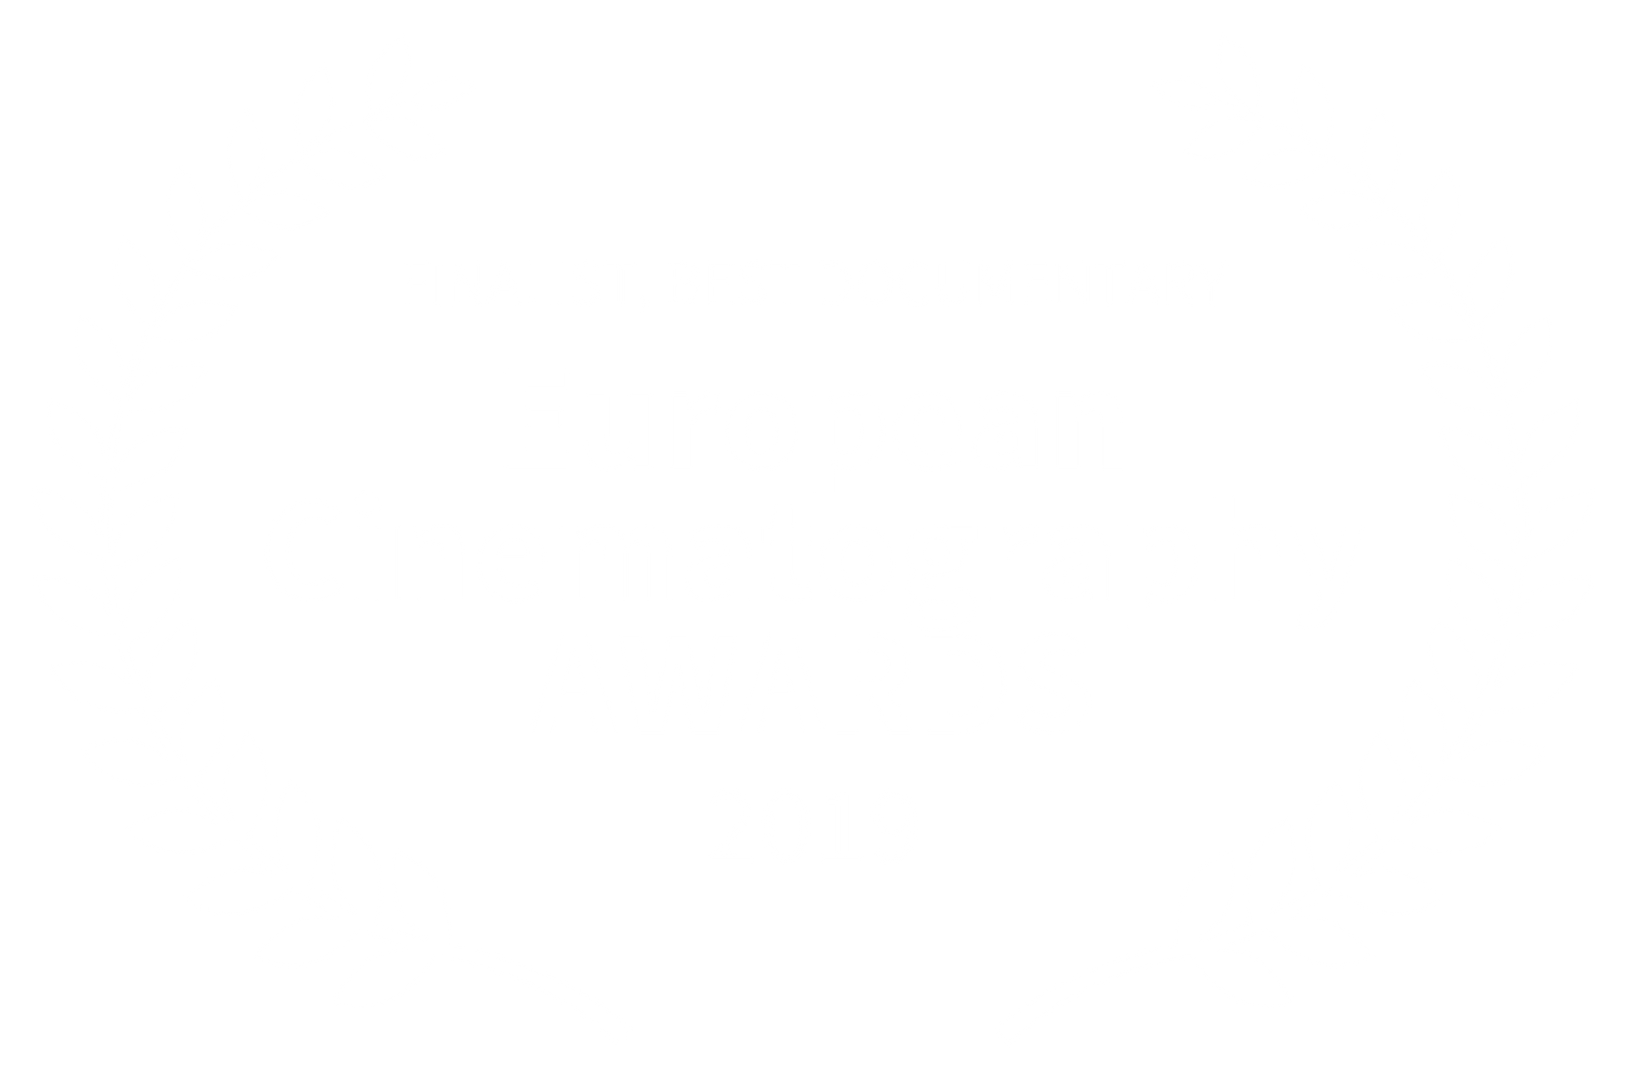 FINALIST BEST DOCUMENTARY - European Cin